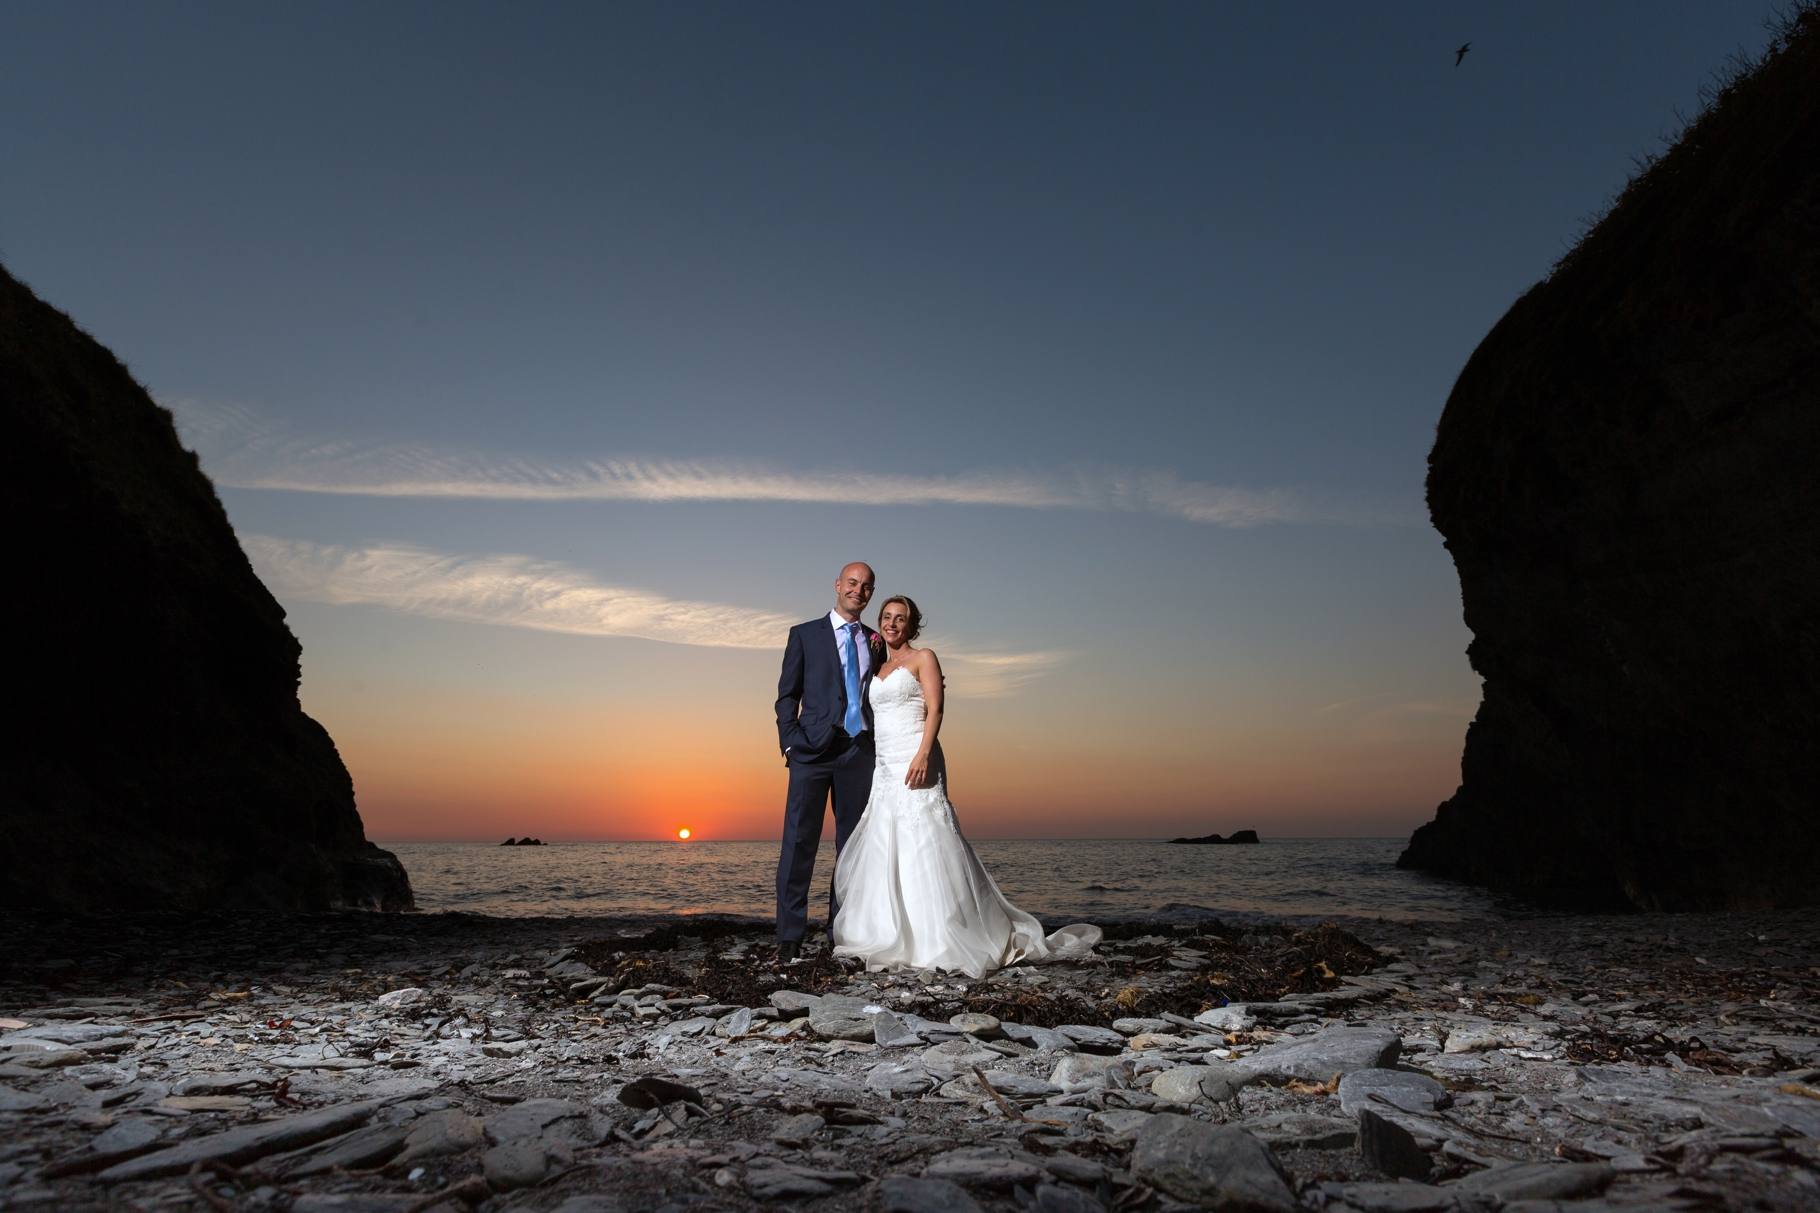 Tunnels Beaches Wedding Photography: Wedding Photography